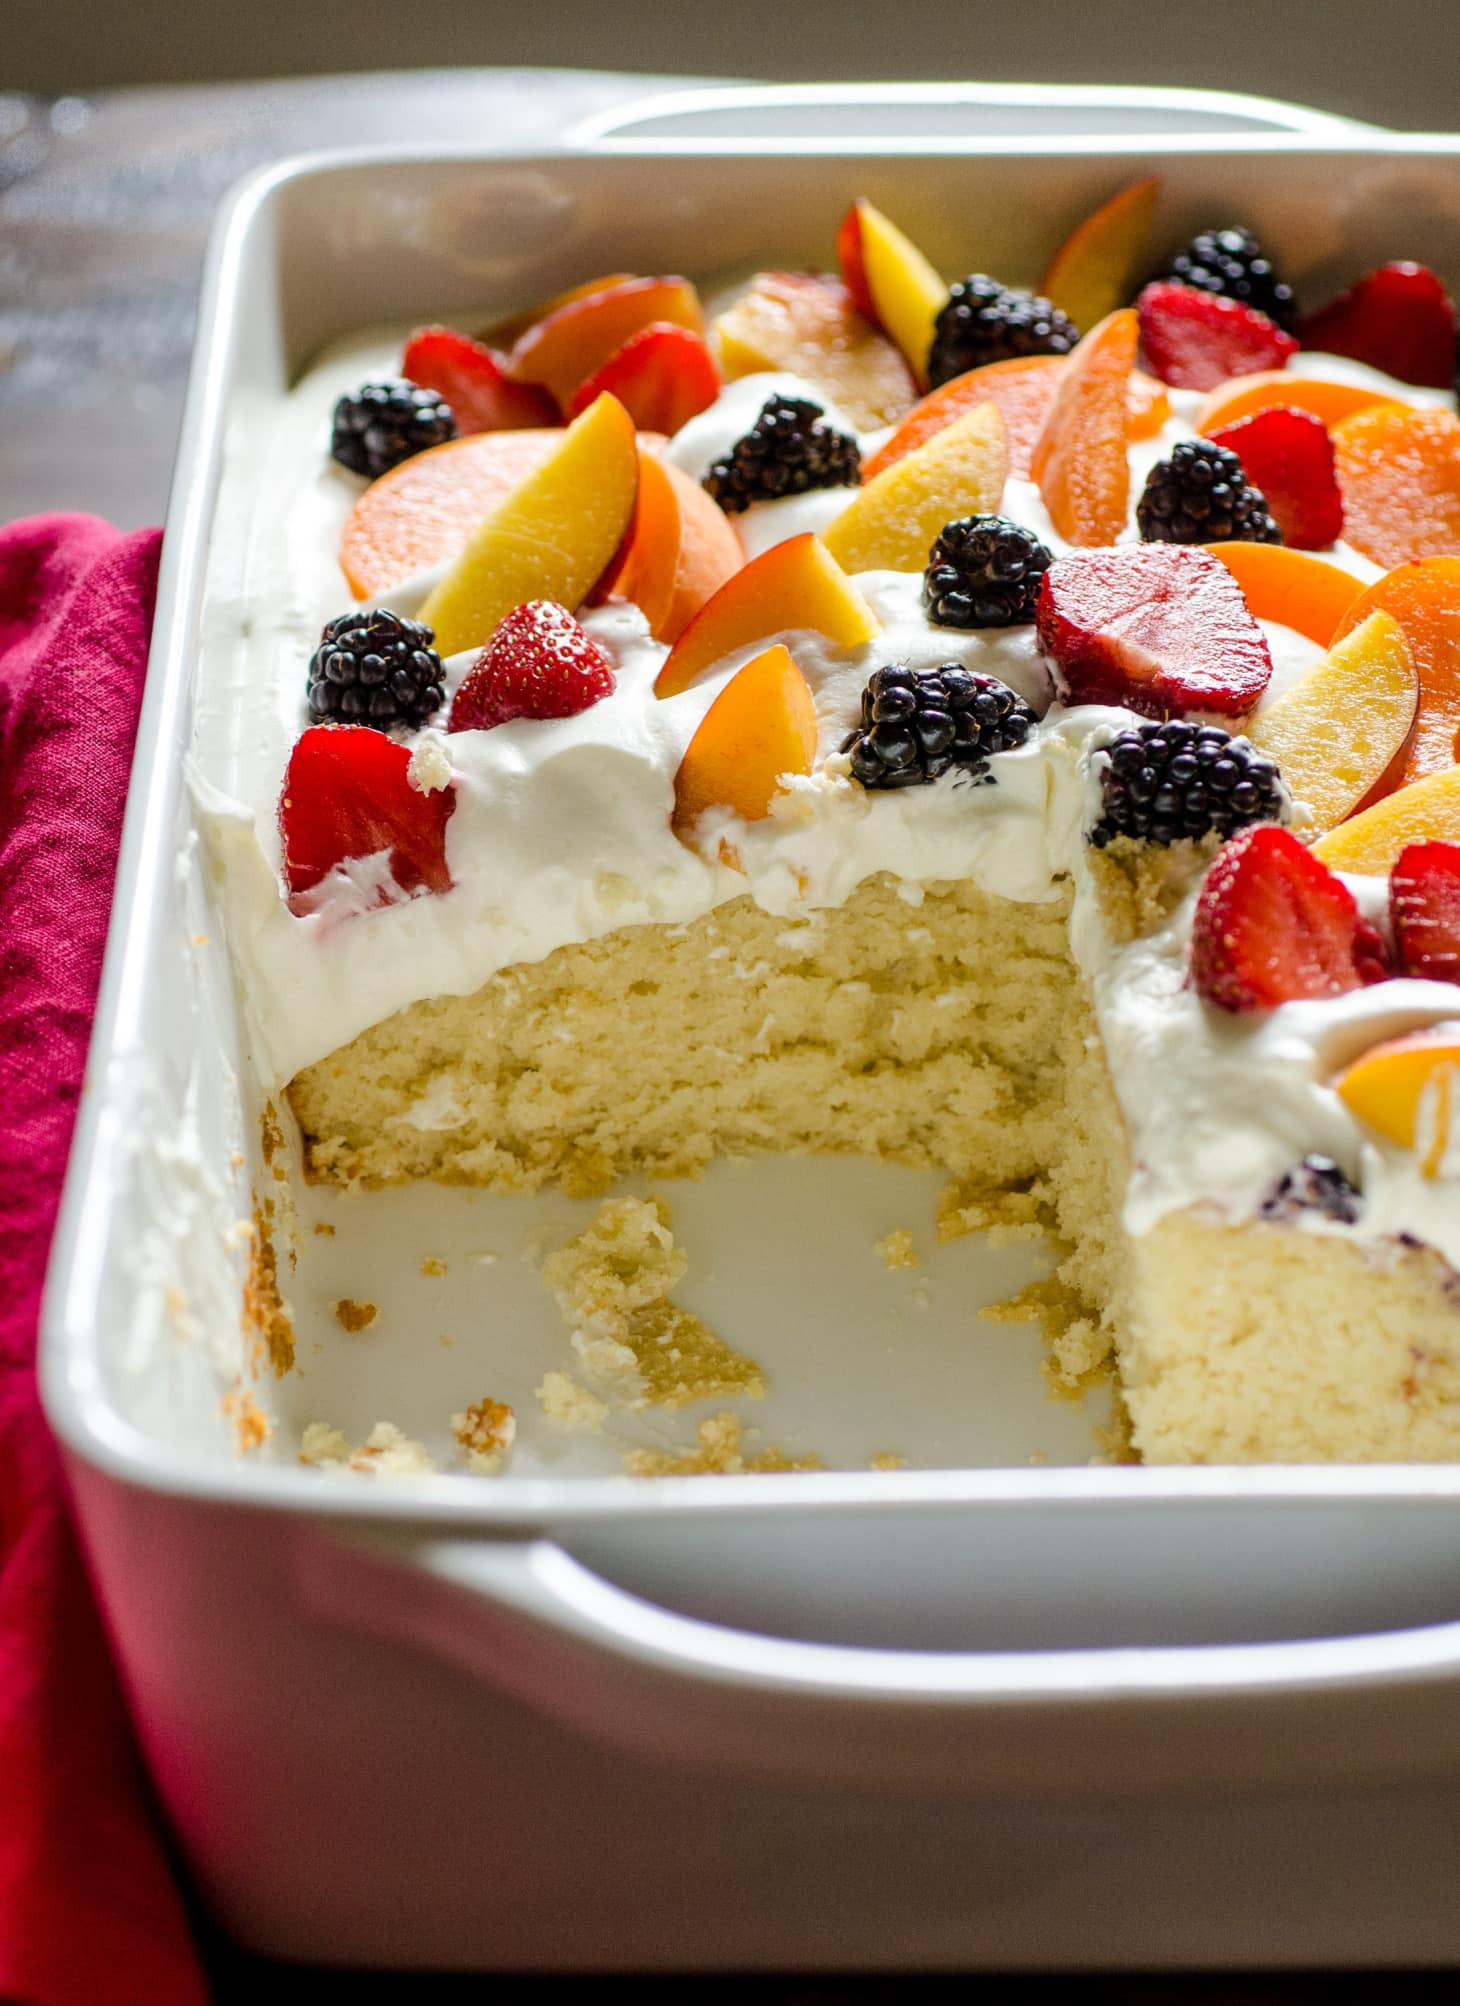 Fruit Cake Recipe Easy  Recipe Easy Summer Cake with Fruit & Cream